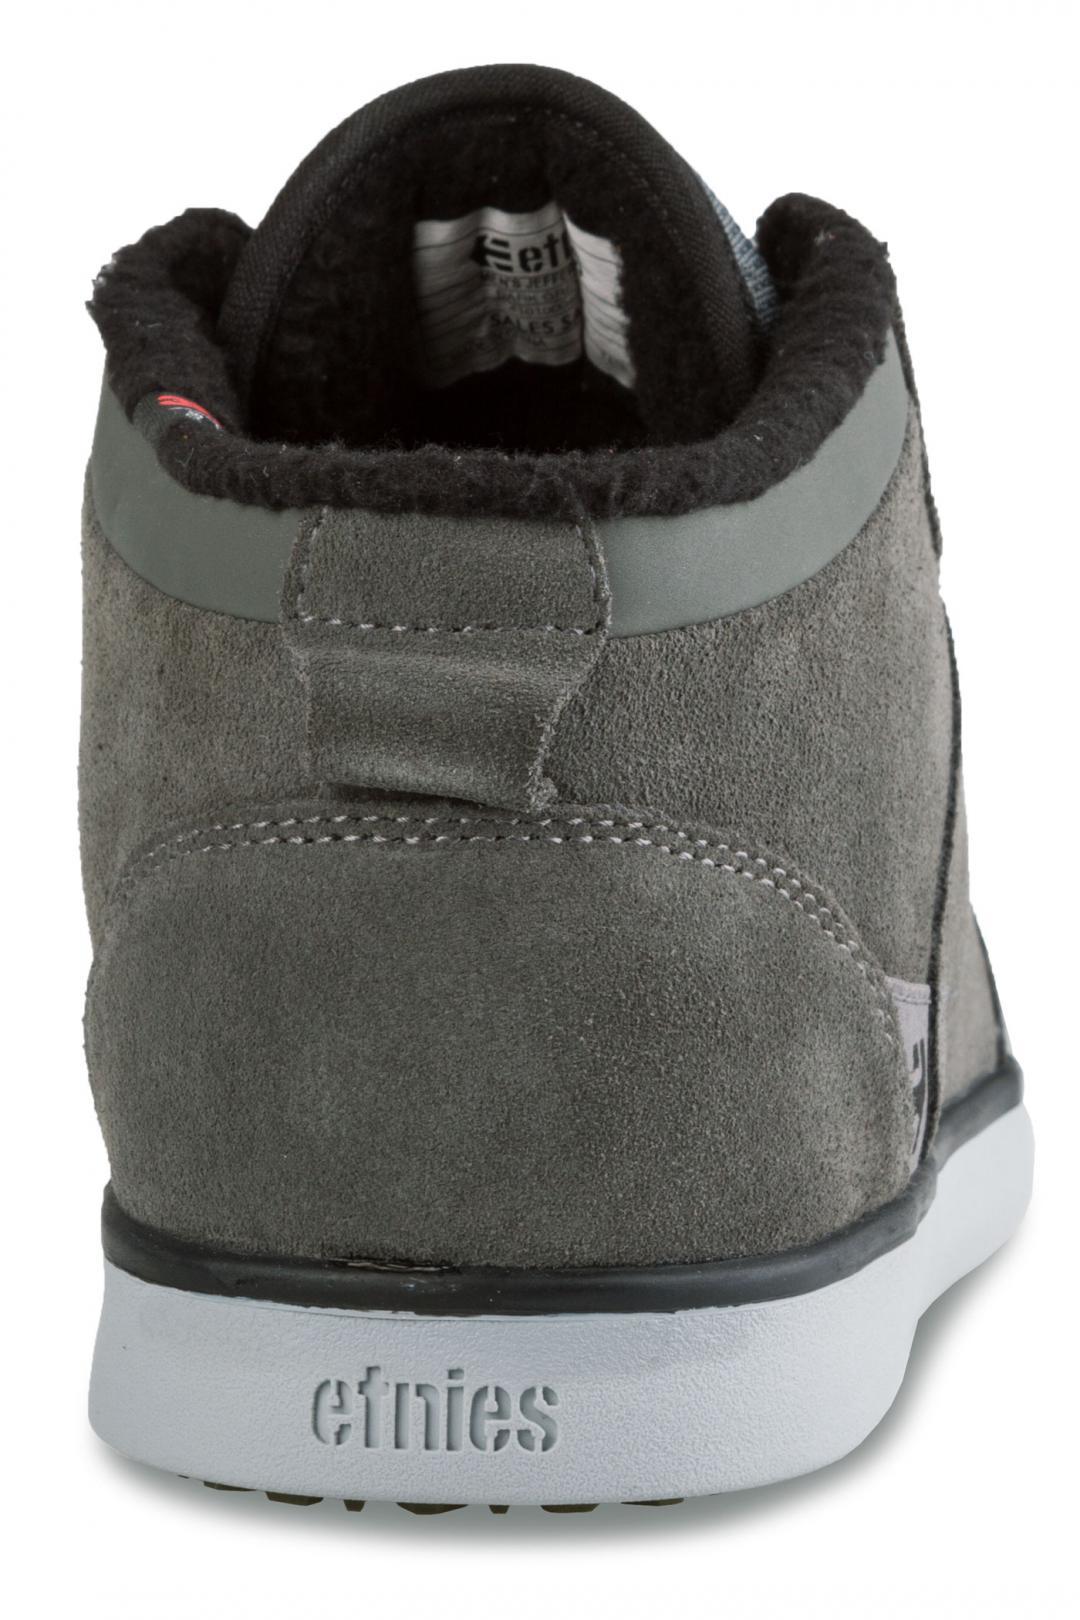 Uomo Etnies Jefferson MTW dark grey grey | Sneakers mid top